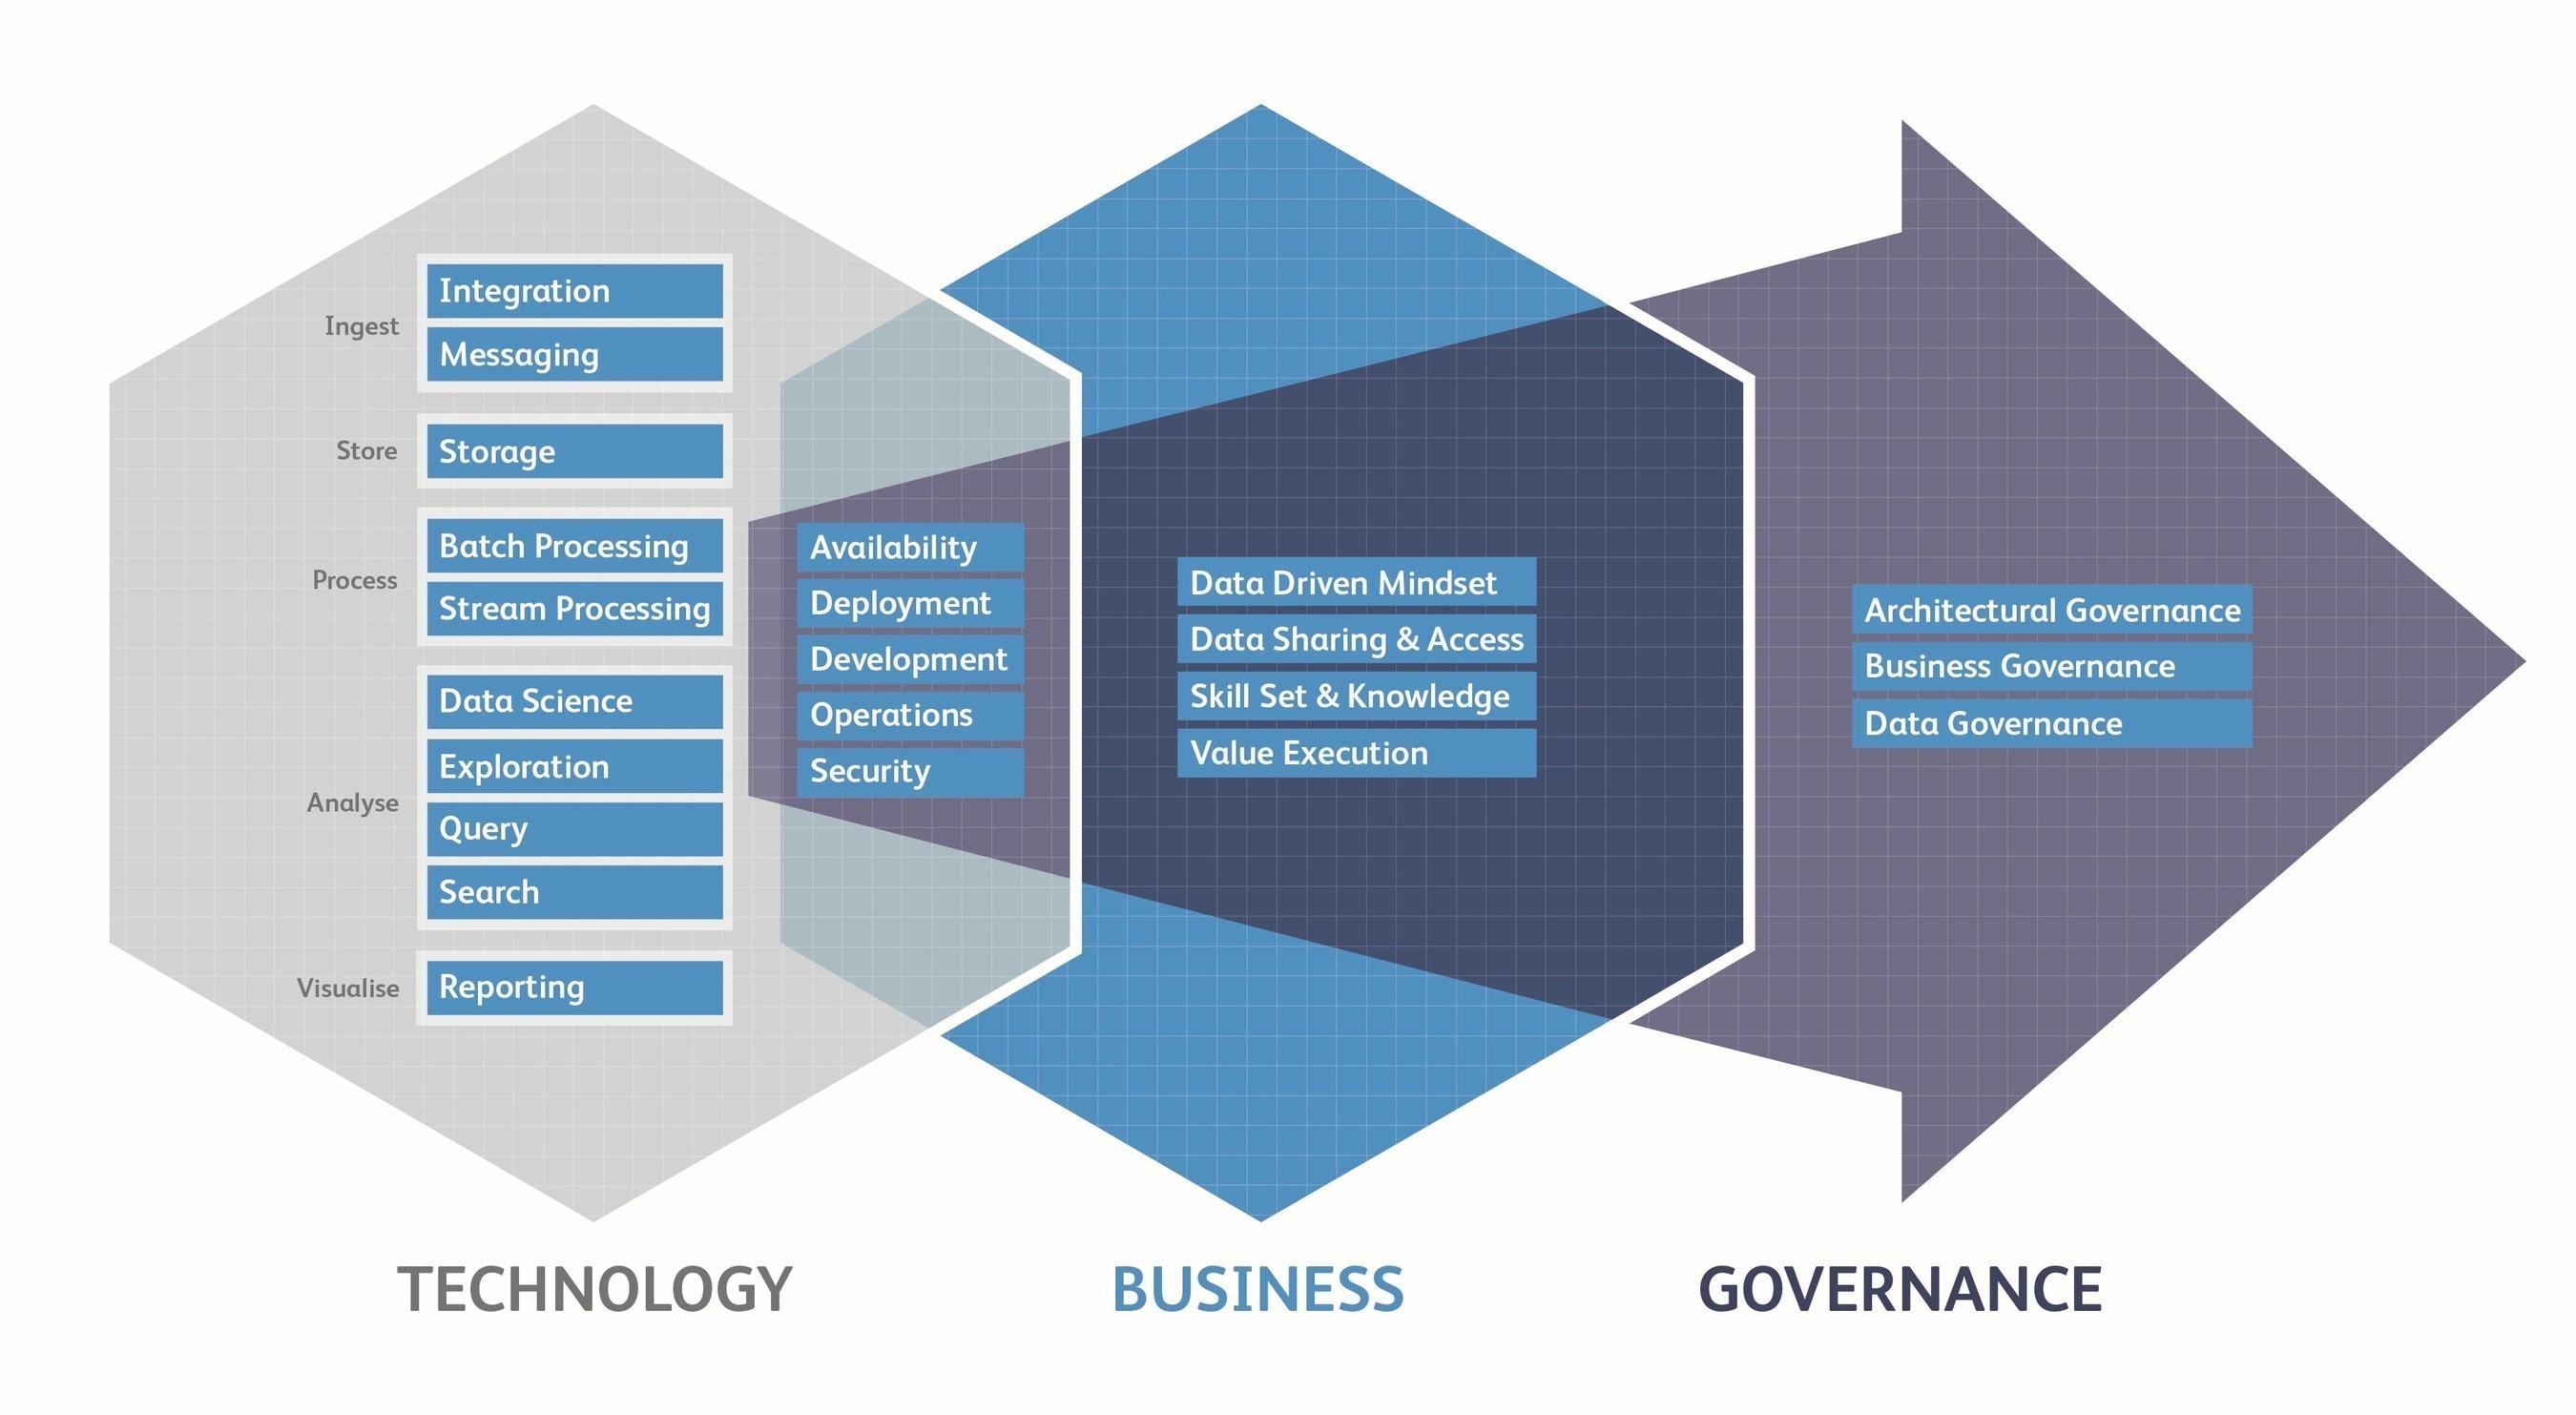 Data Capability Framework - 22 capabilities evaluated through the process (PRNewsFoto/Big Data Partnership)